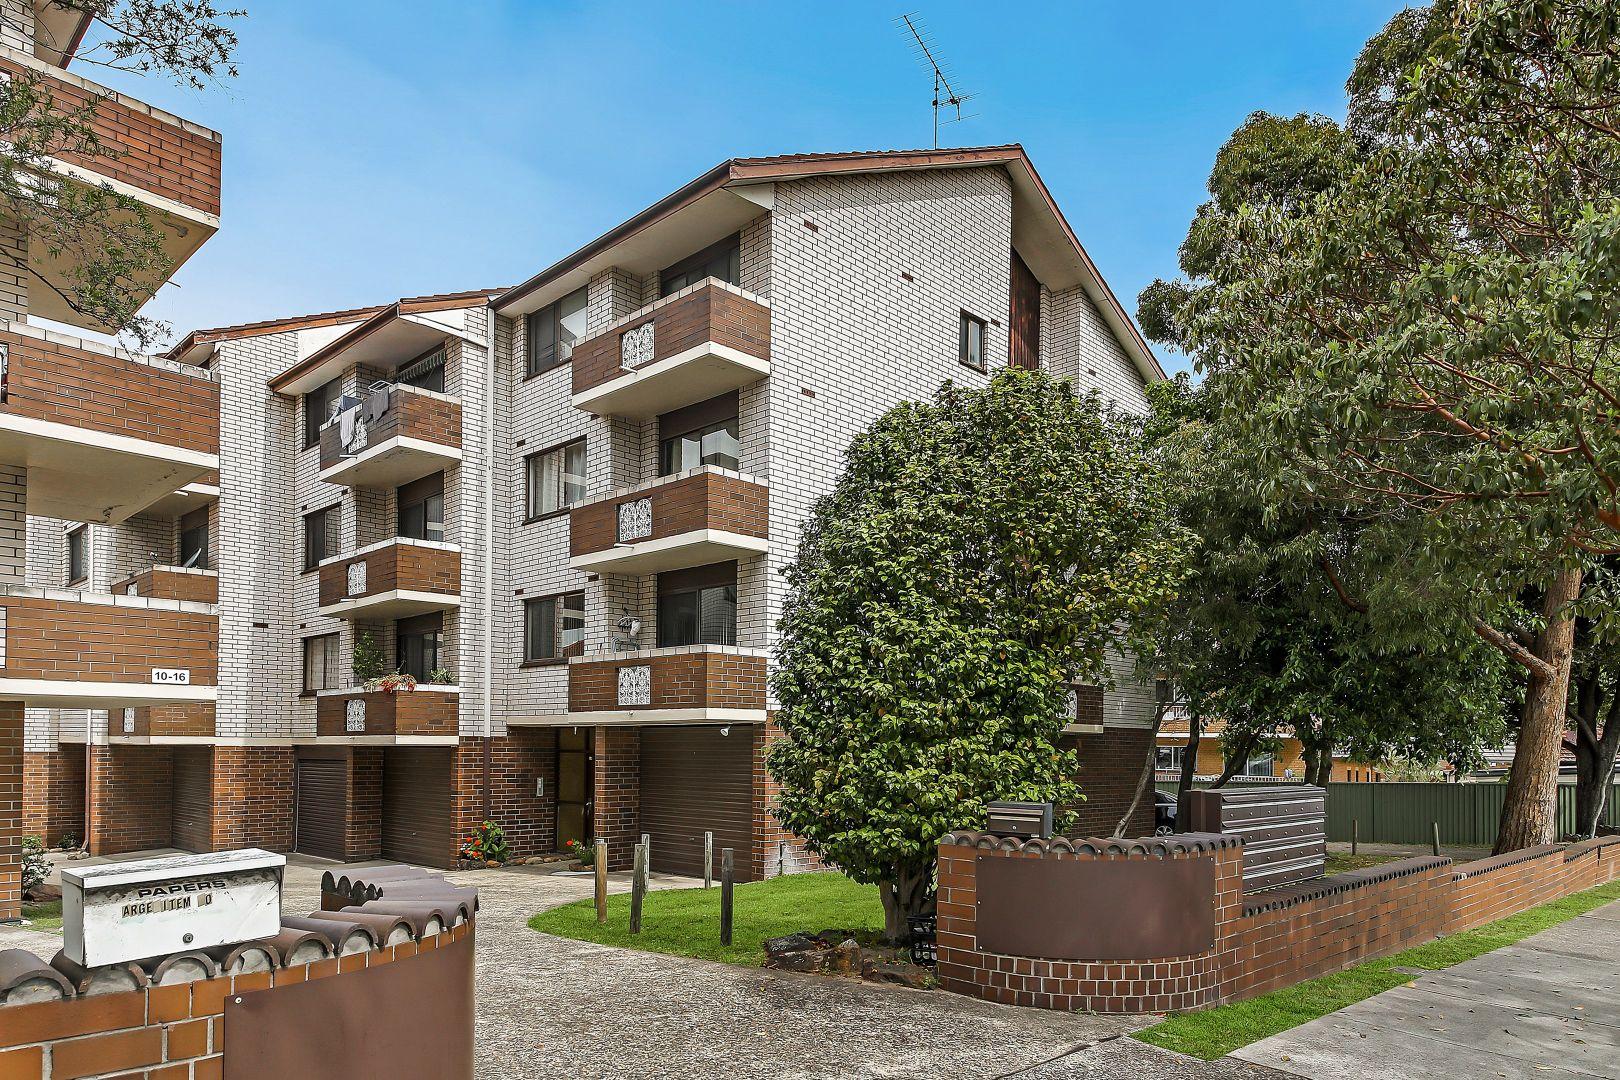 7/10-16 Hegerty Street, Rockdale NSW 2216, Image 1